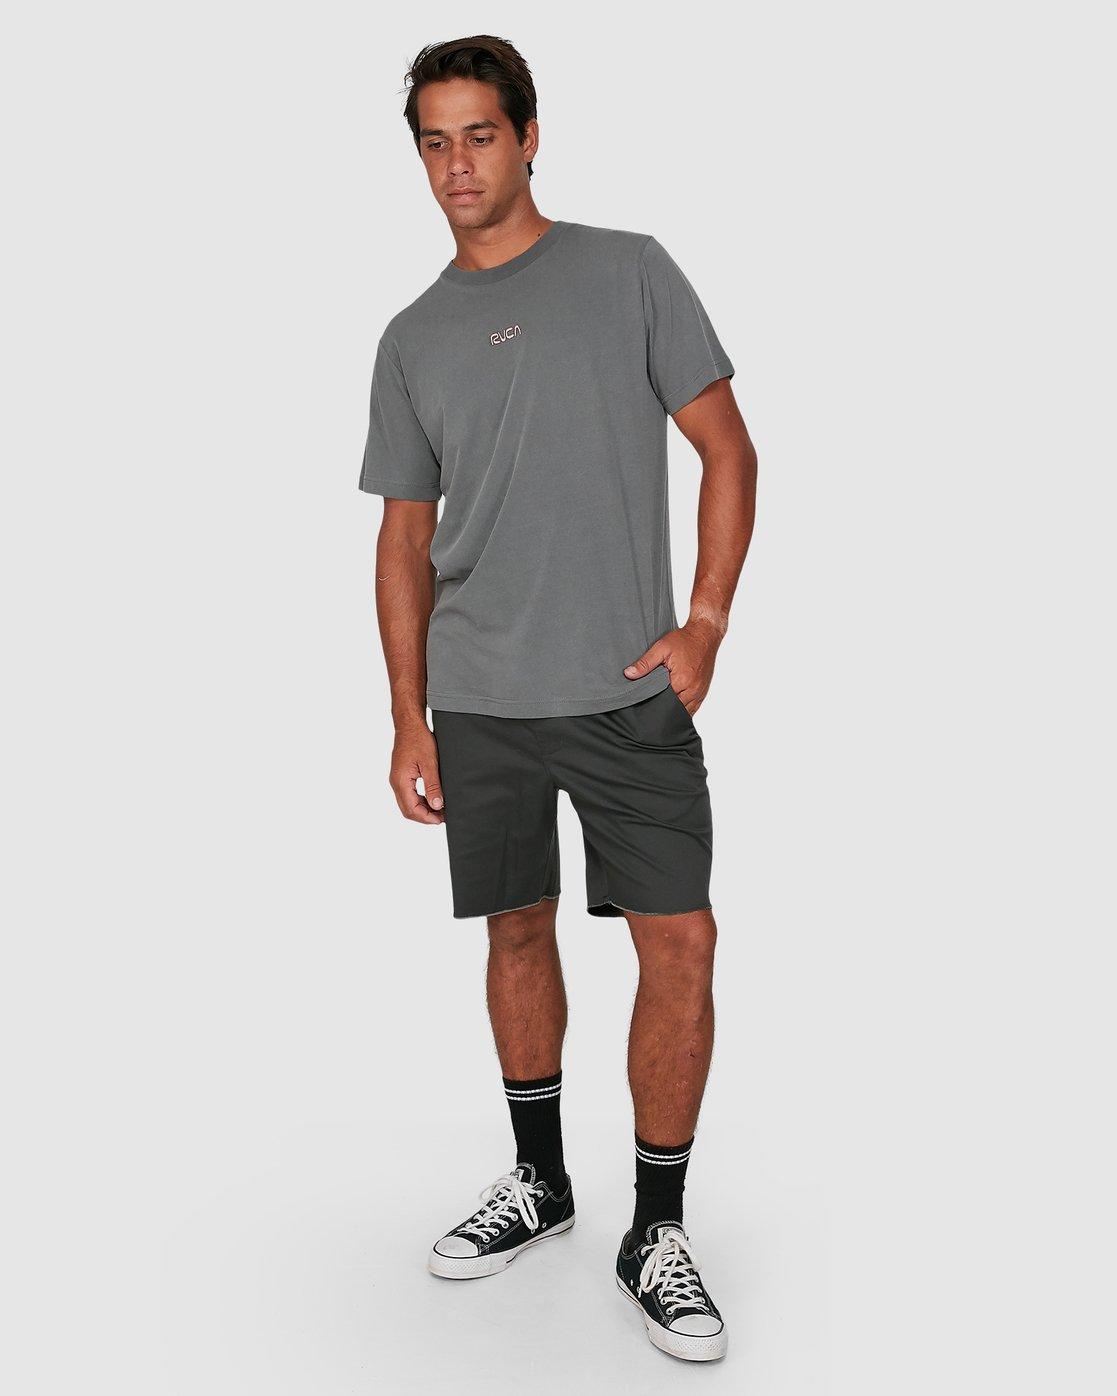 5 Cantina Short Sleeve Tee Grey R106057 RVCA